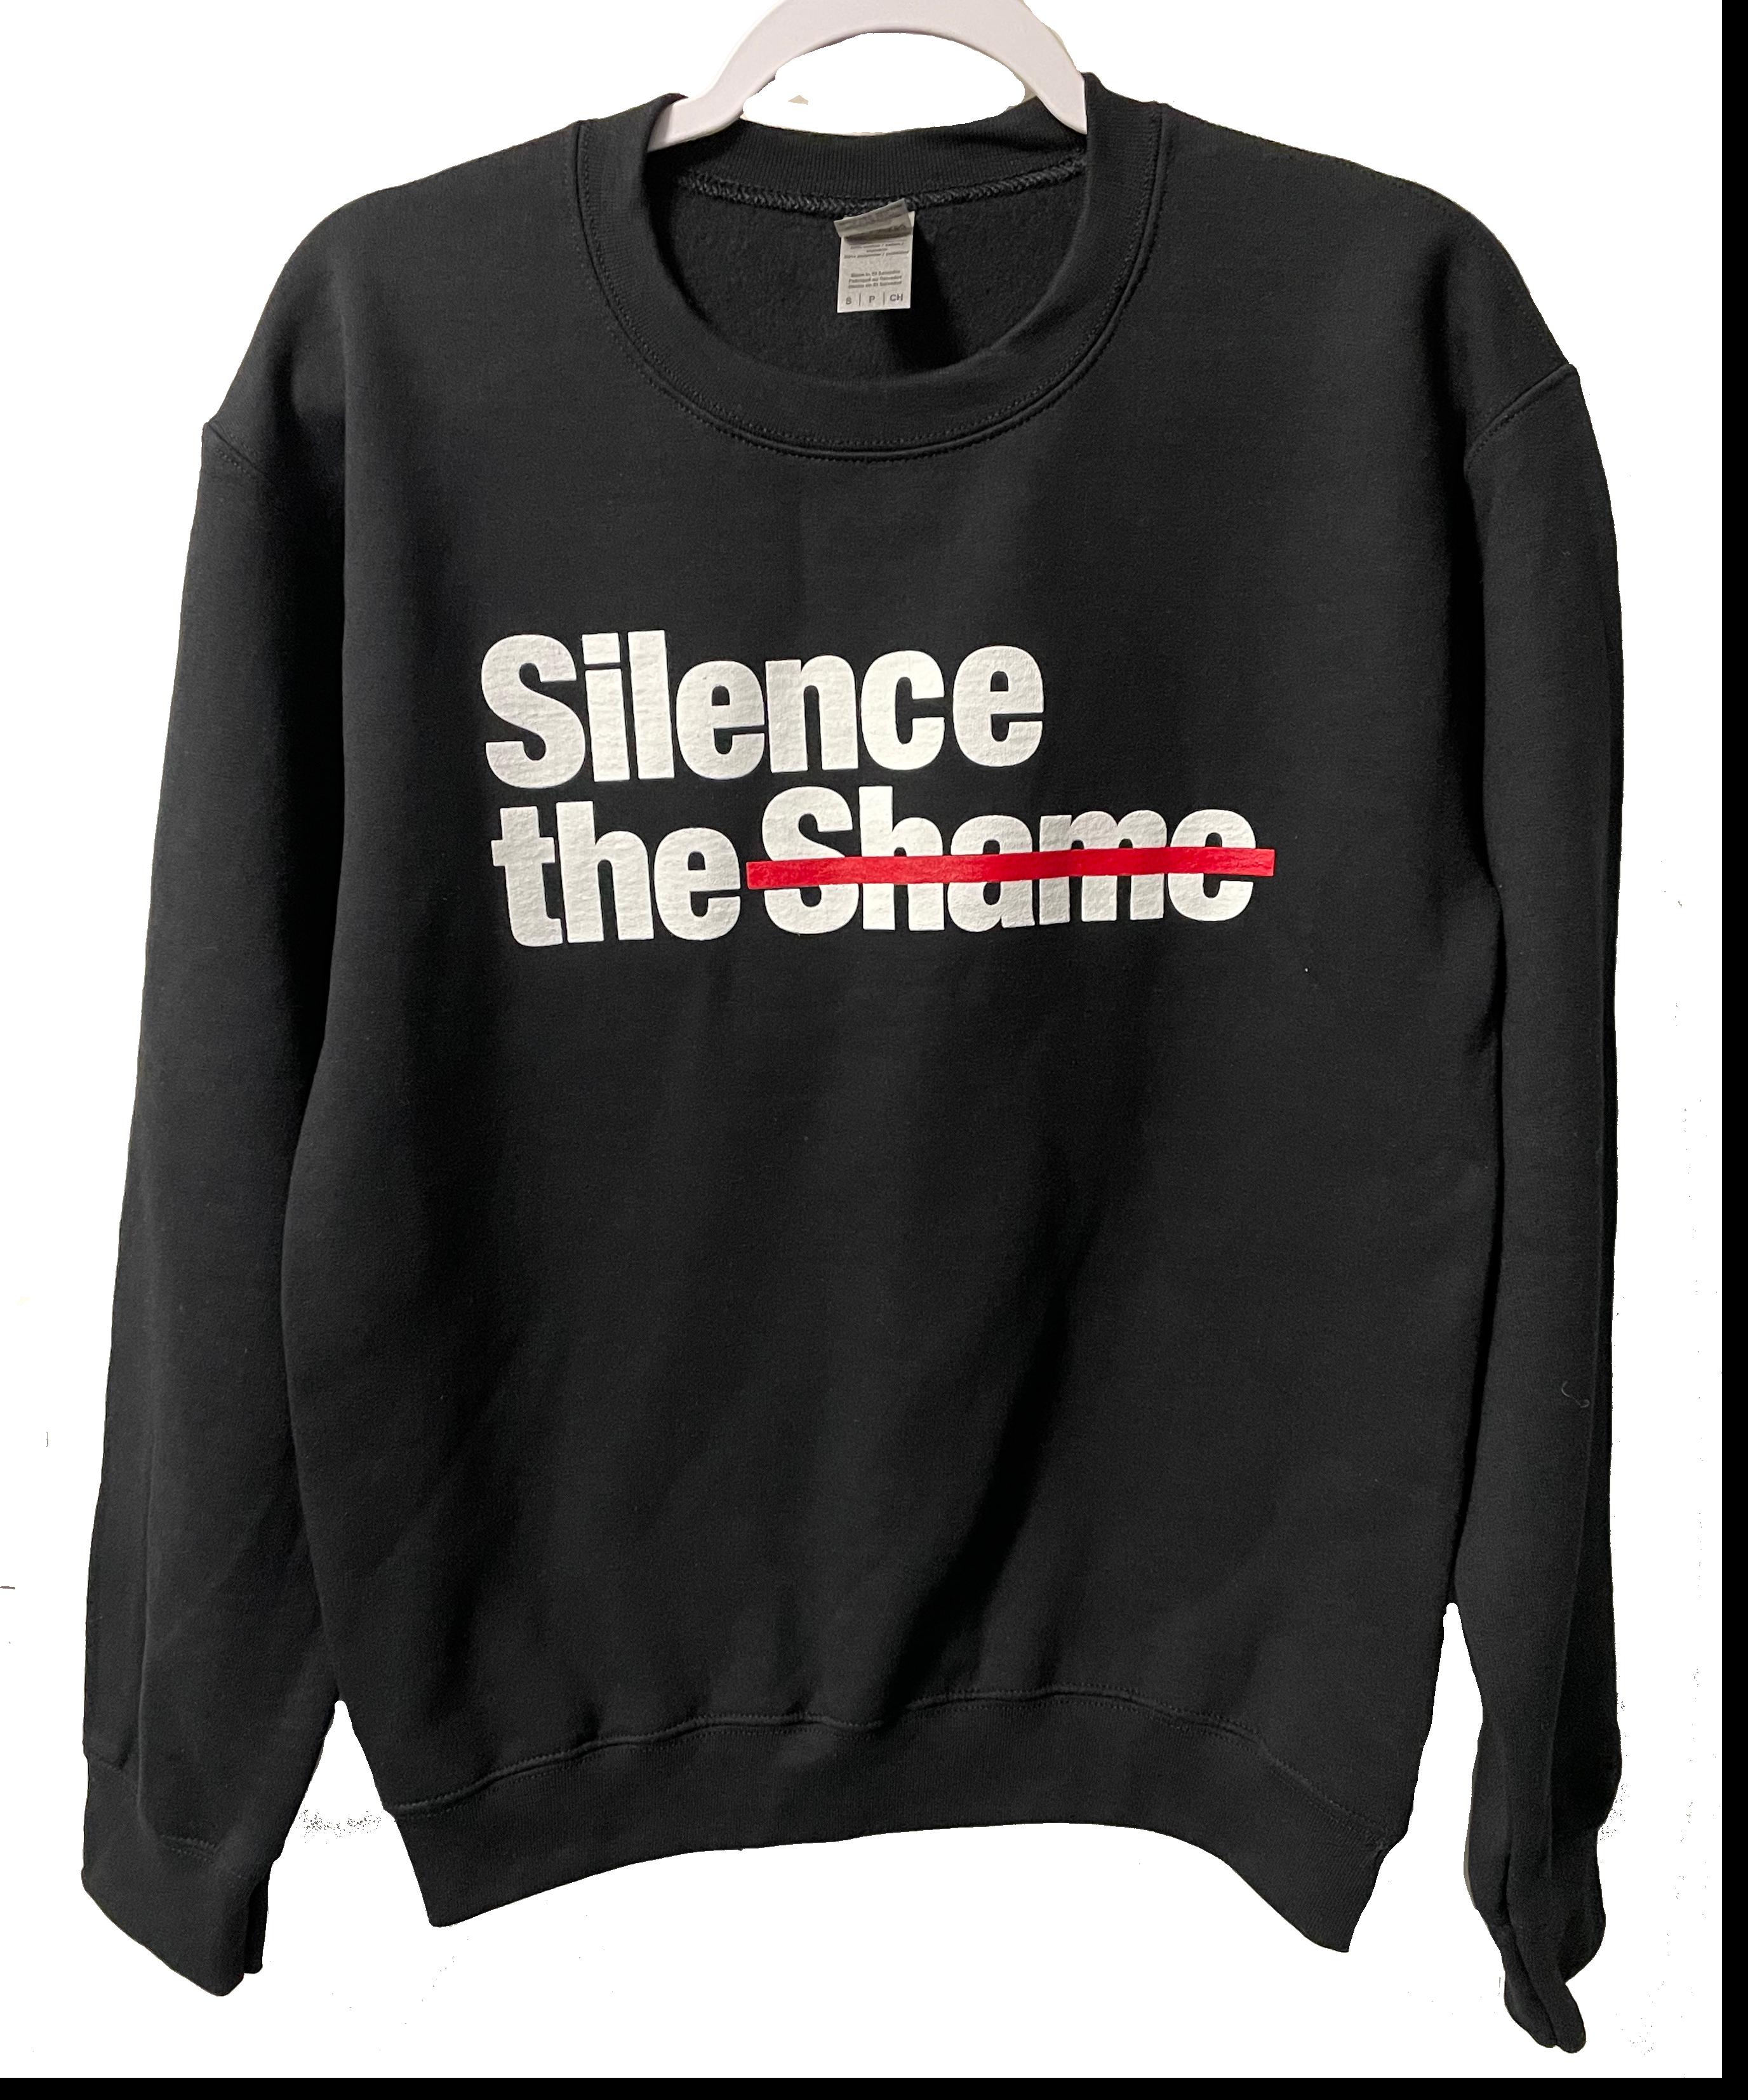 Silence the Shame Signature Black Crewneck Sweatshirt 2XL